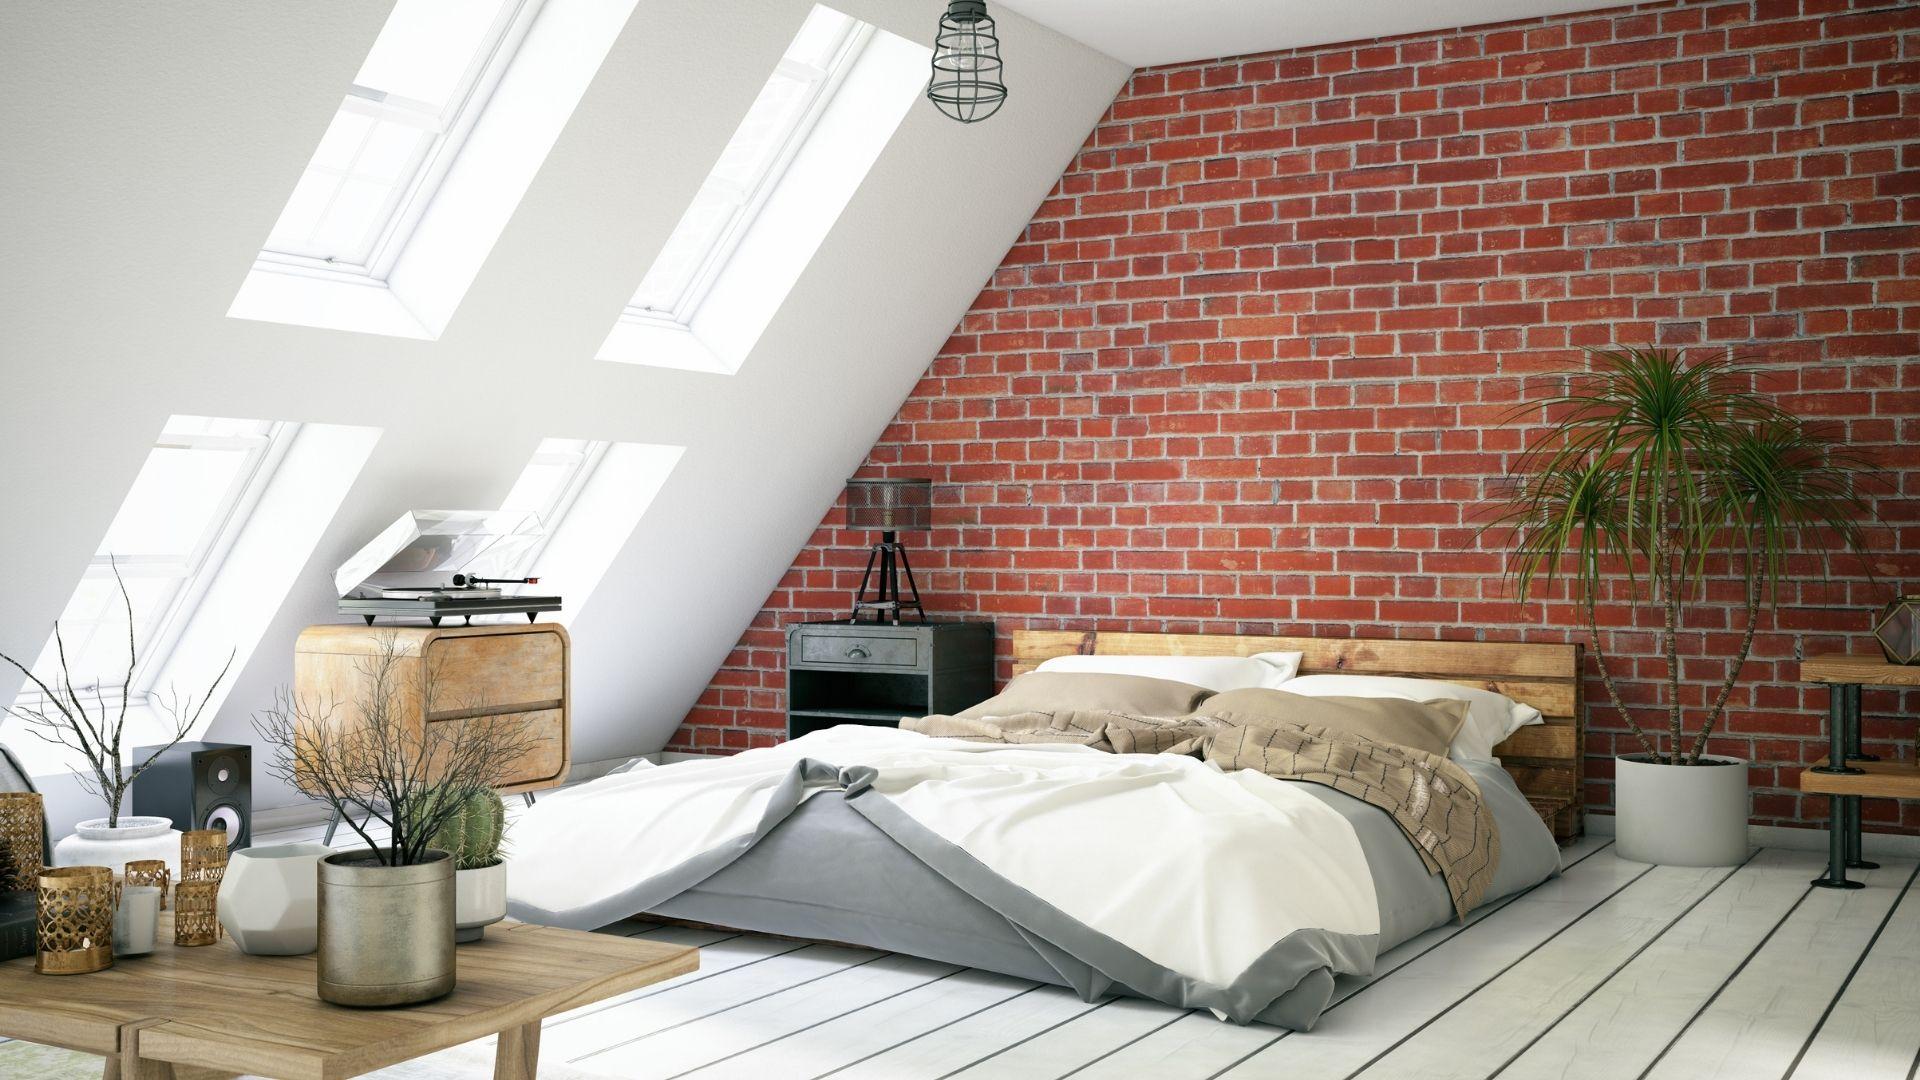 jak zbudować pokój na strychu